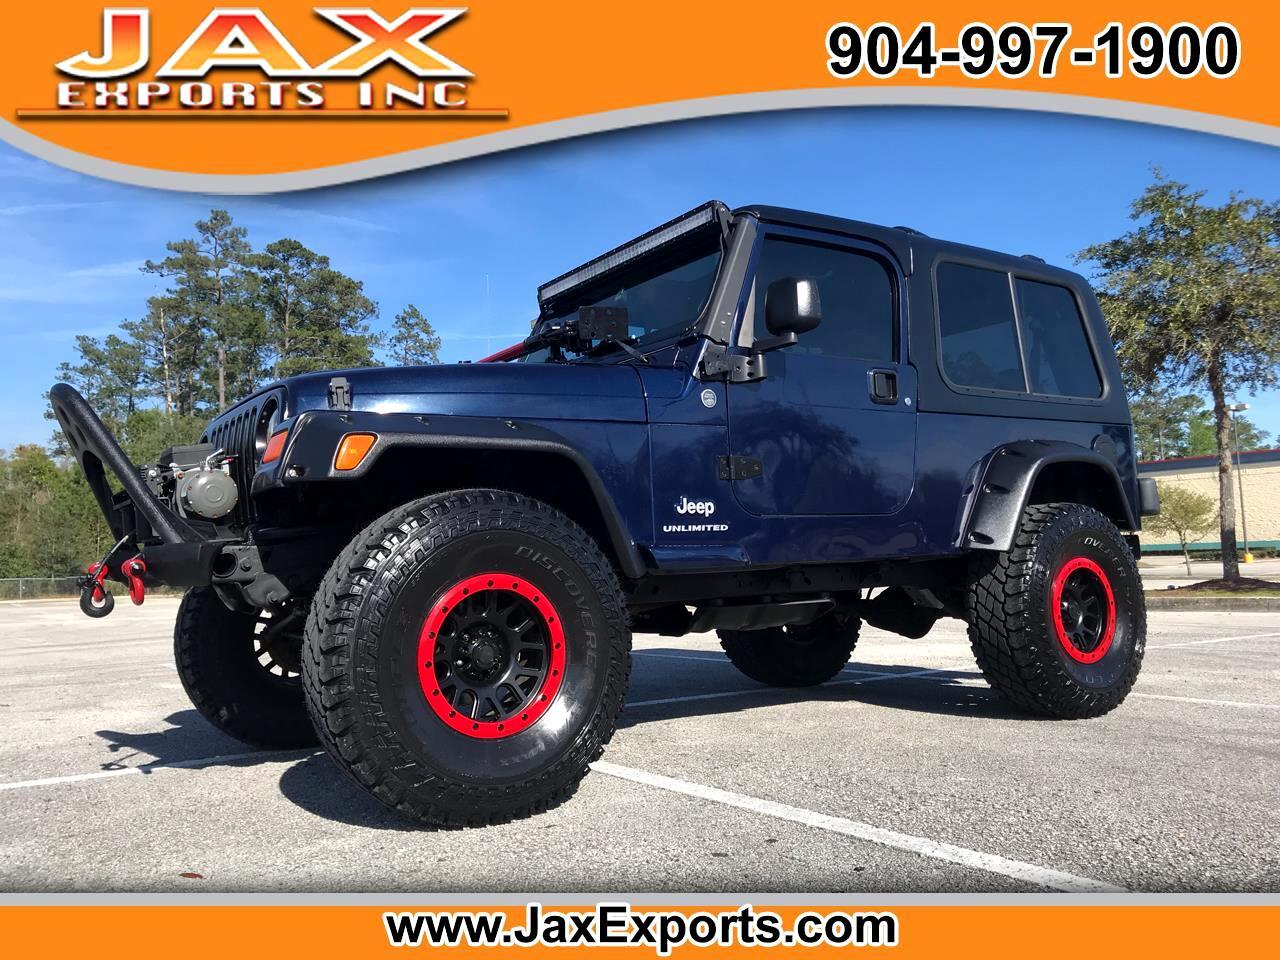 2006 Jeep Wrangler 2dr Unlimited LWB